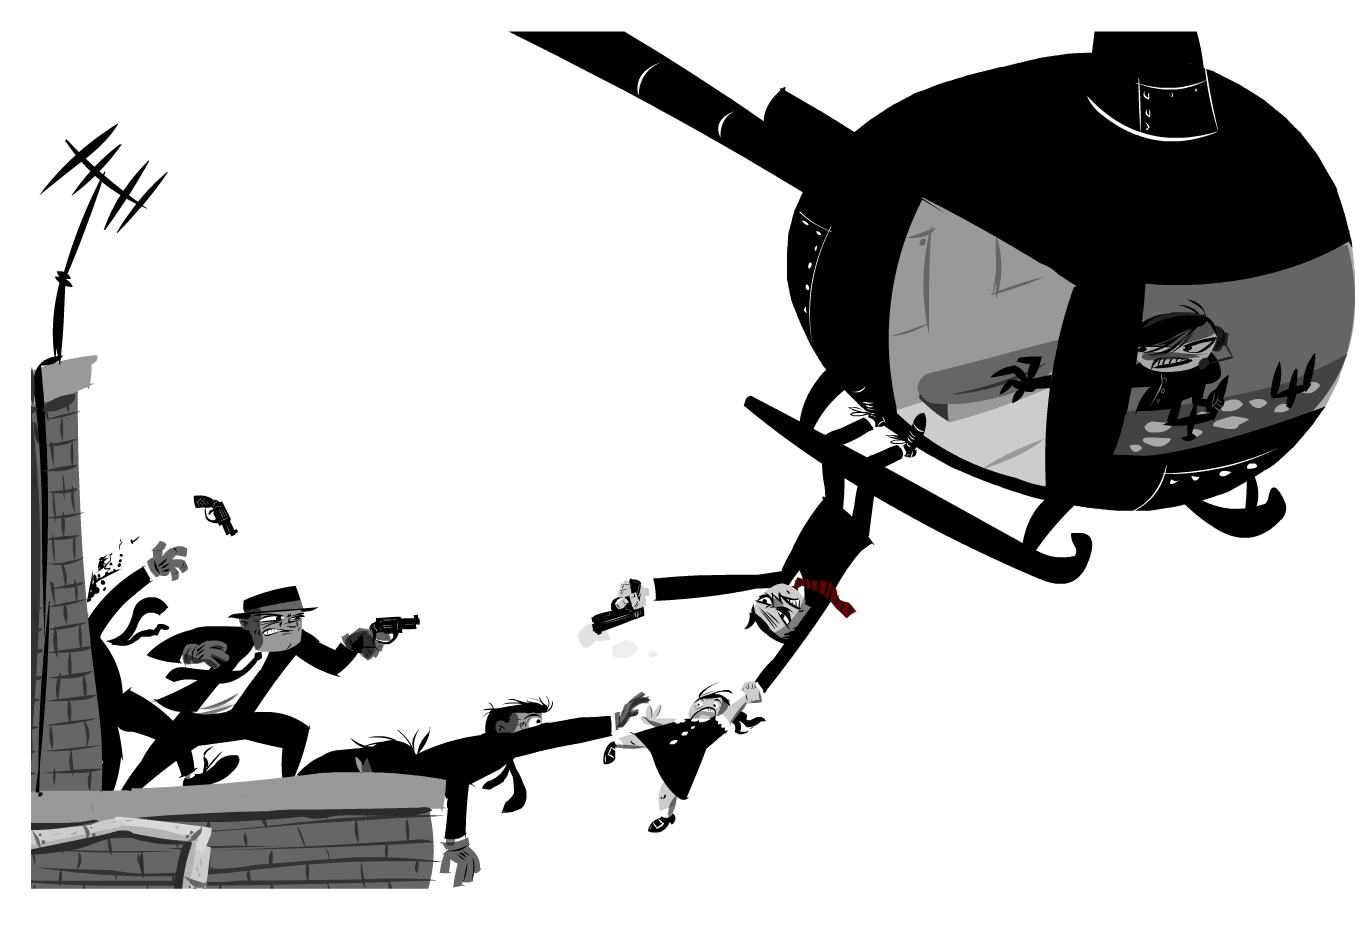 [black+helicopter.jpg]